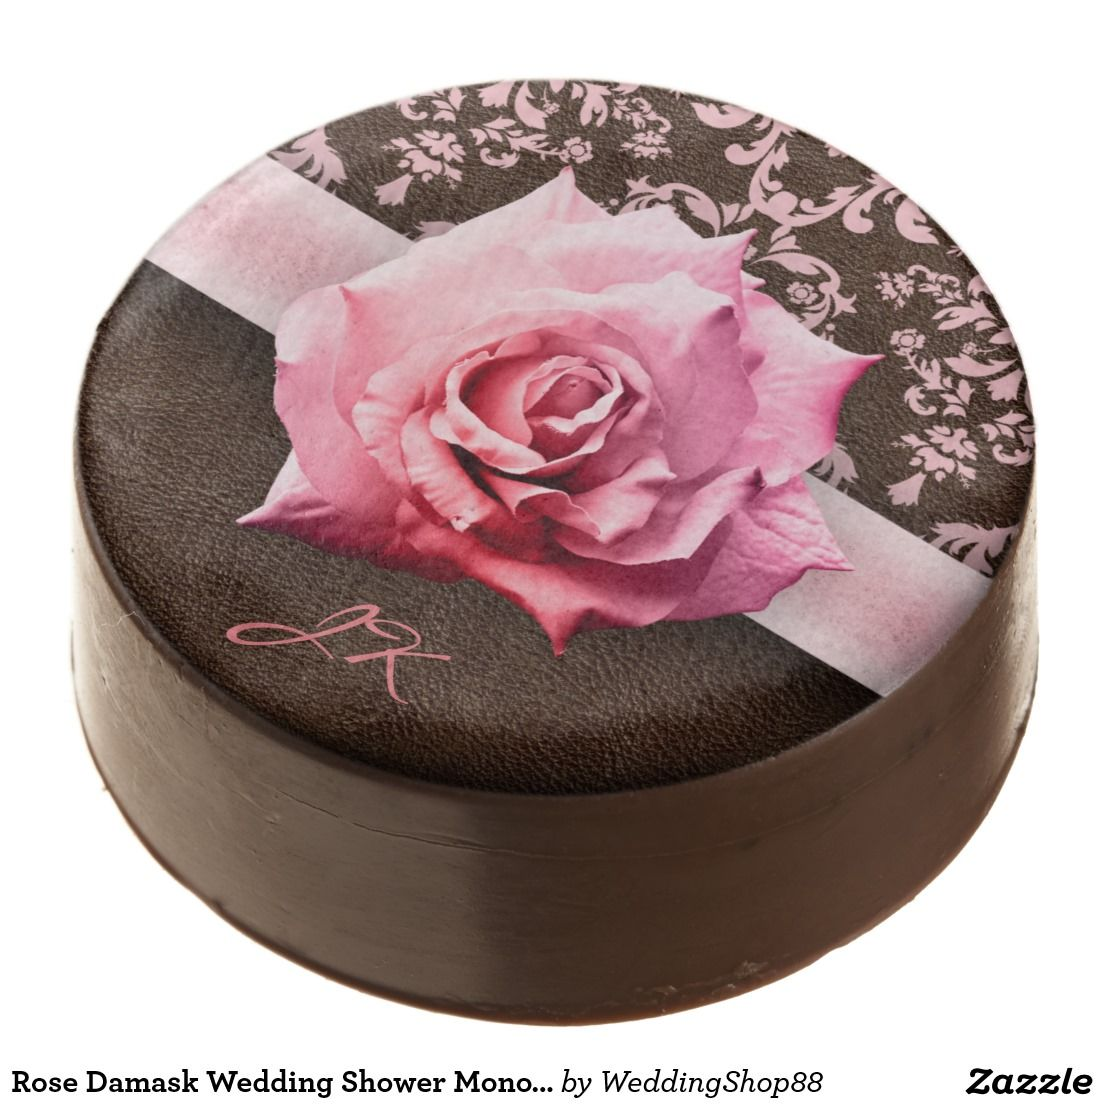 Rose Damask Wedding Shower Monogram Chocolate Dipped Oreo | Dipped ...